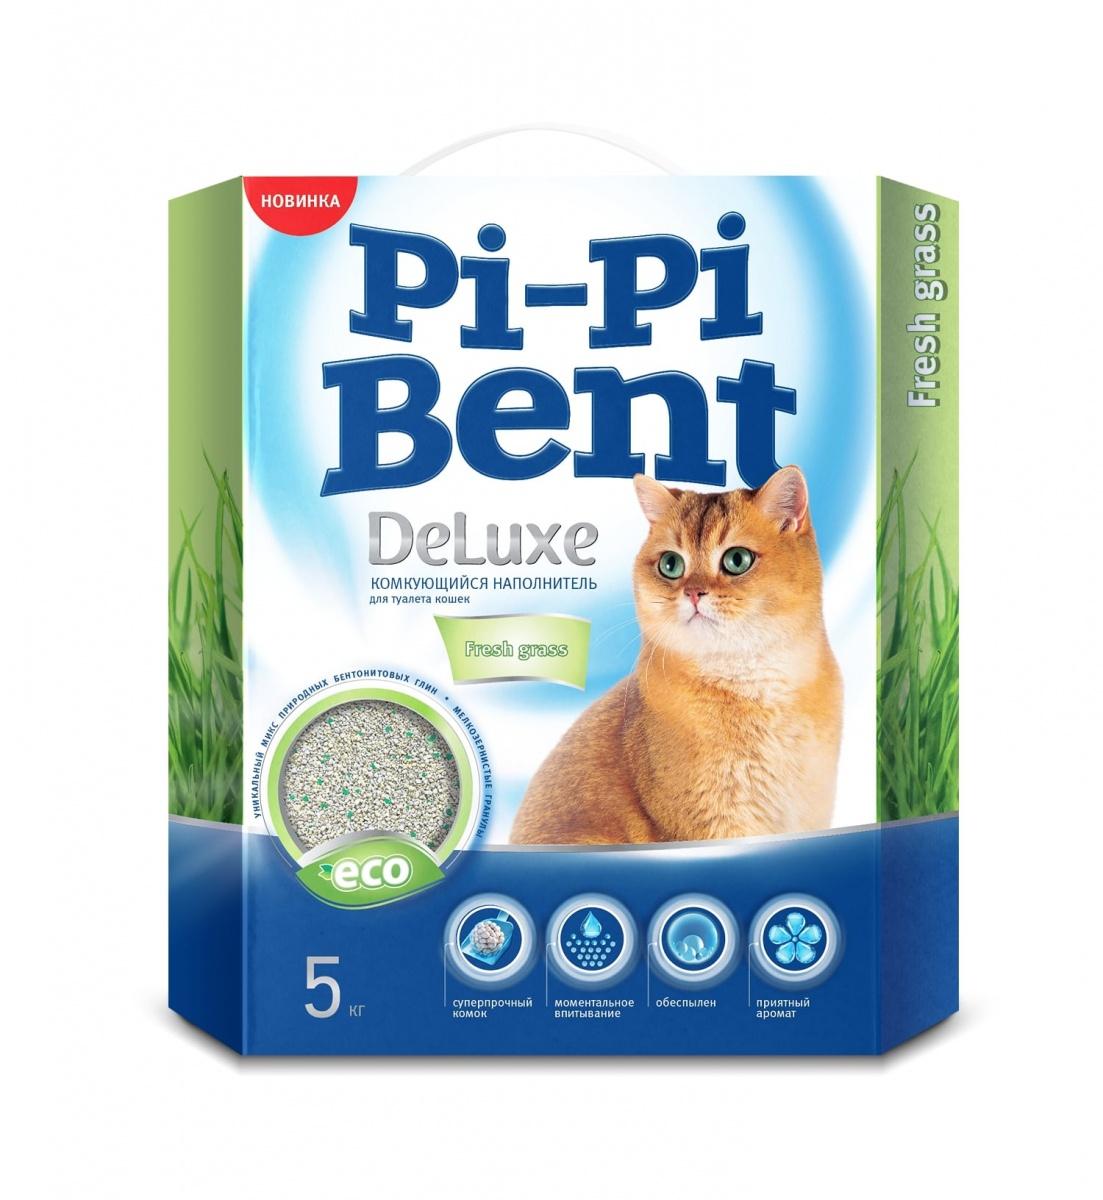 Pi-Pi Bent DeLuxe Fresh grass ароматизированный комкующийся, коробка 5 кг